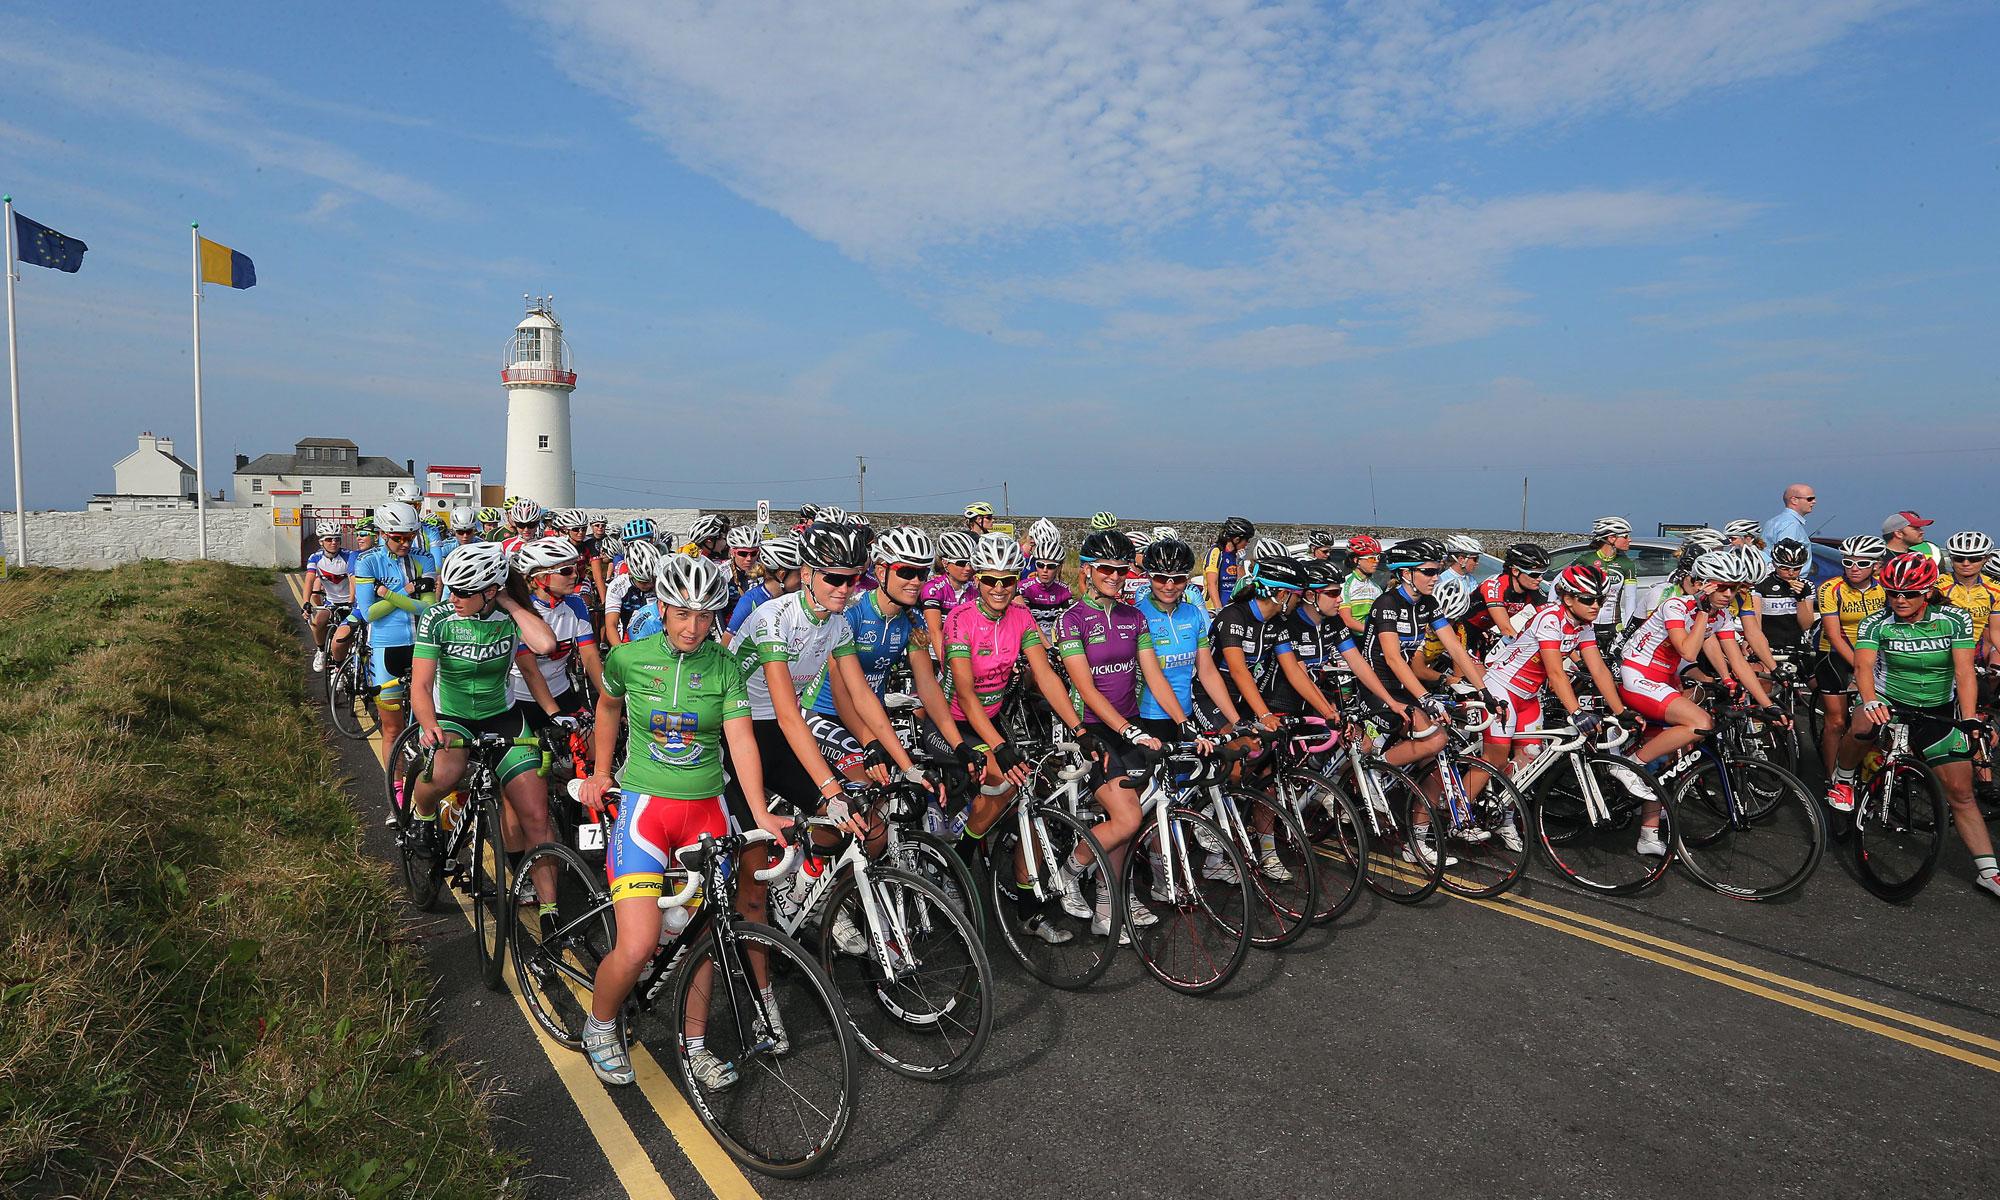 2014 Rás na mBan Stage 2 - Loop Head to Ballyvaughan